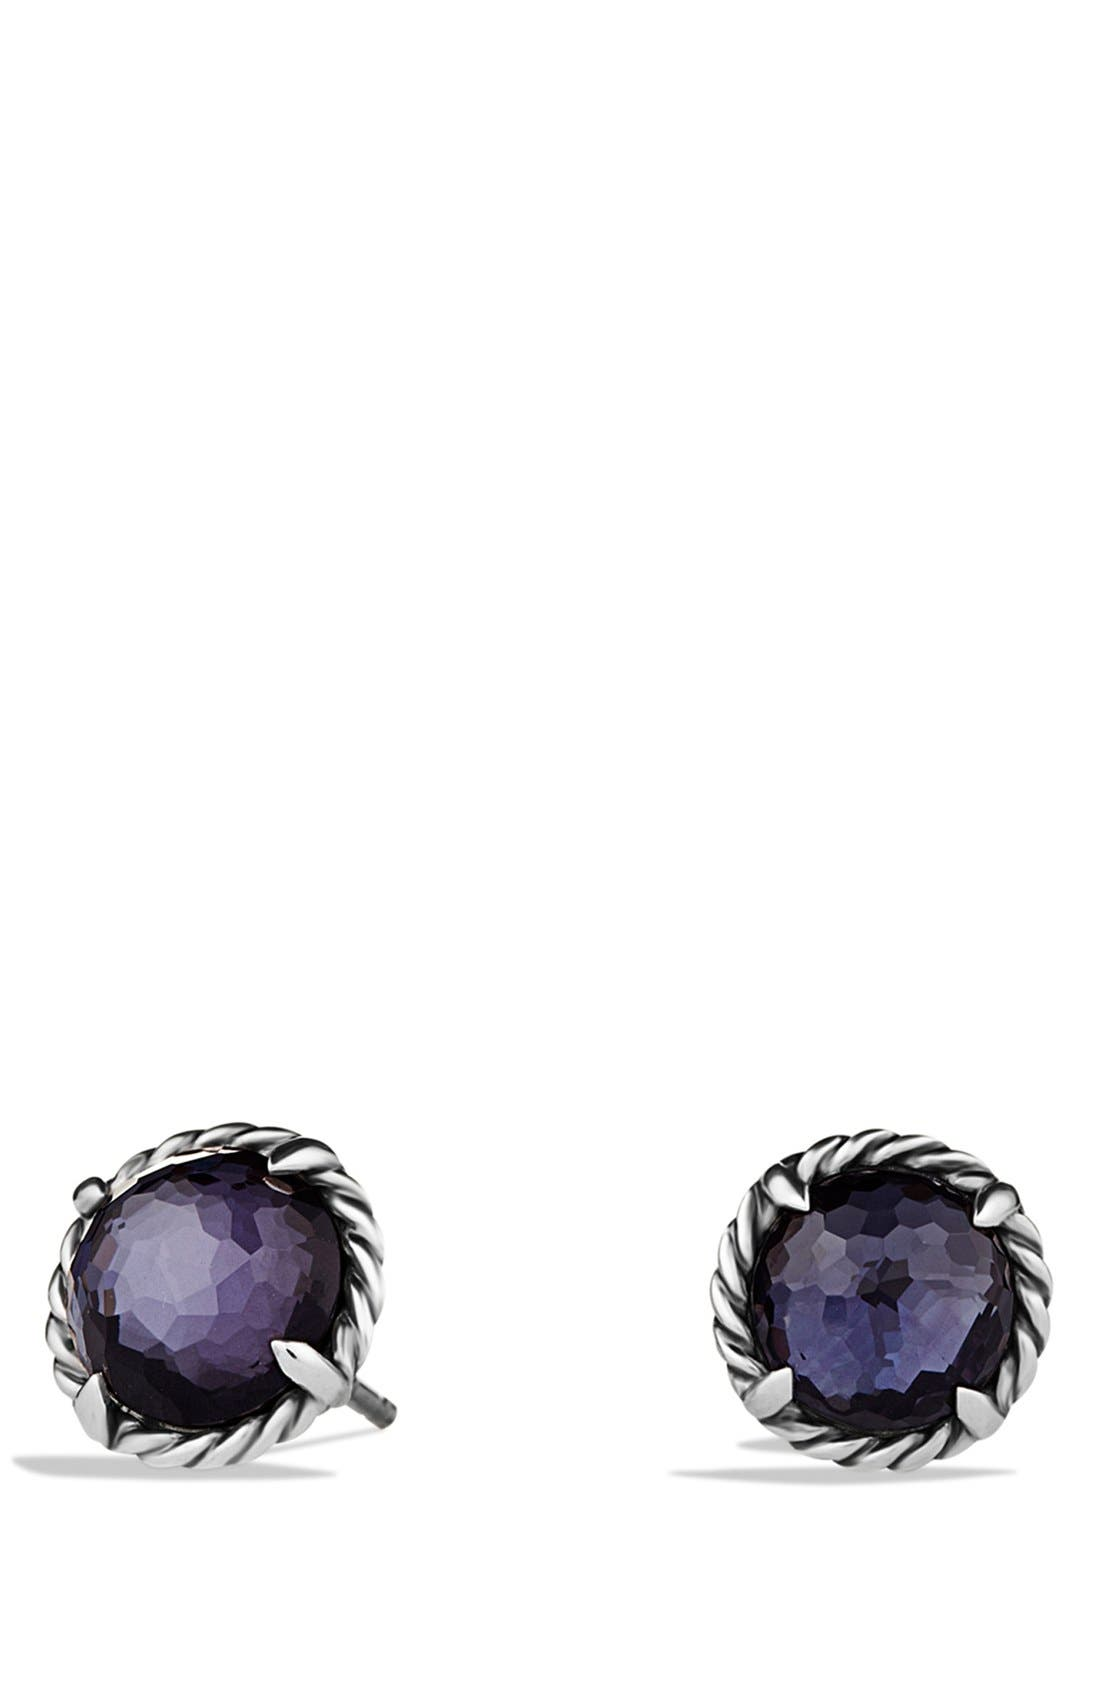 Alternate Image 1 Selected - David Yurman 'Châtelaine' Earrings